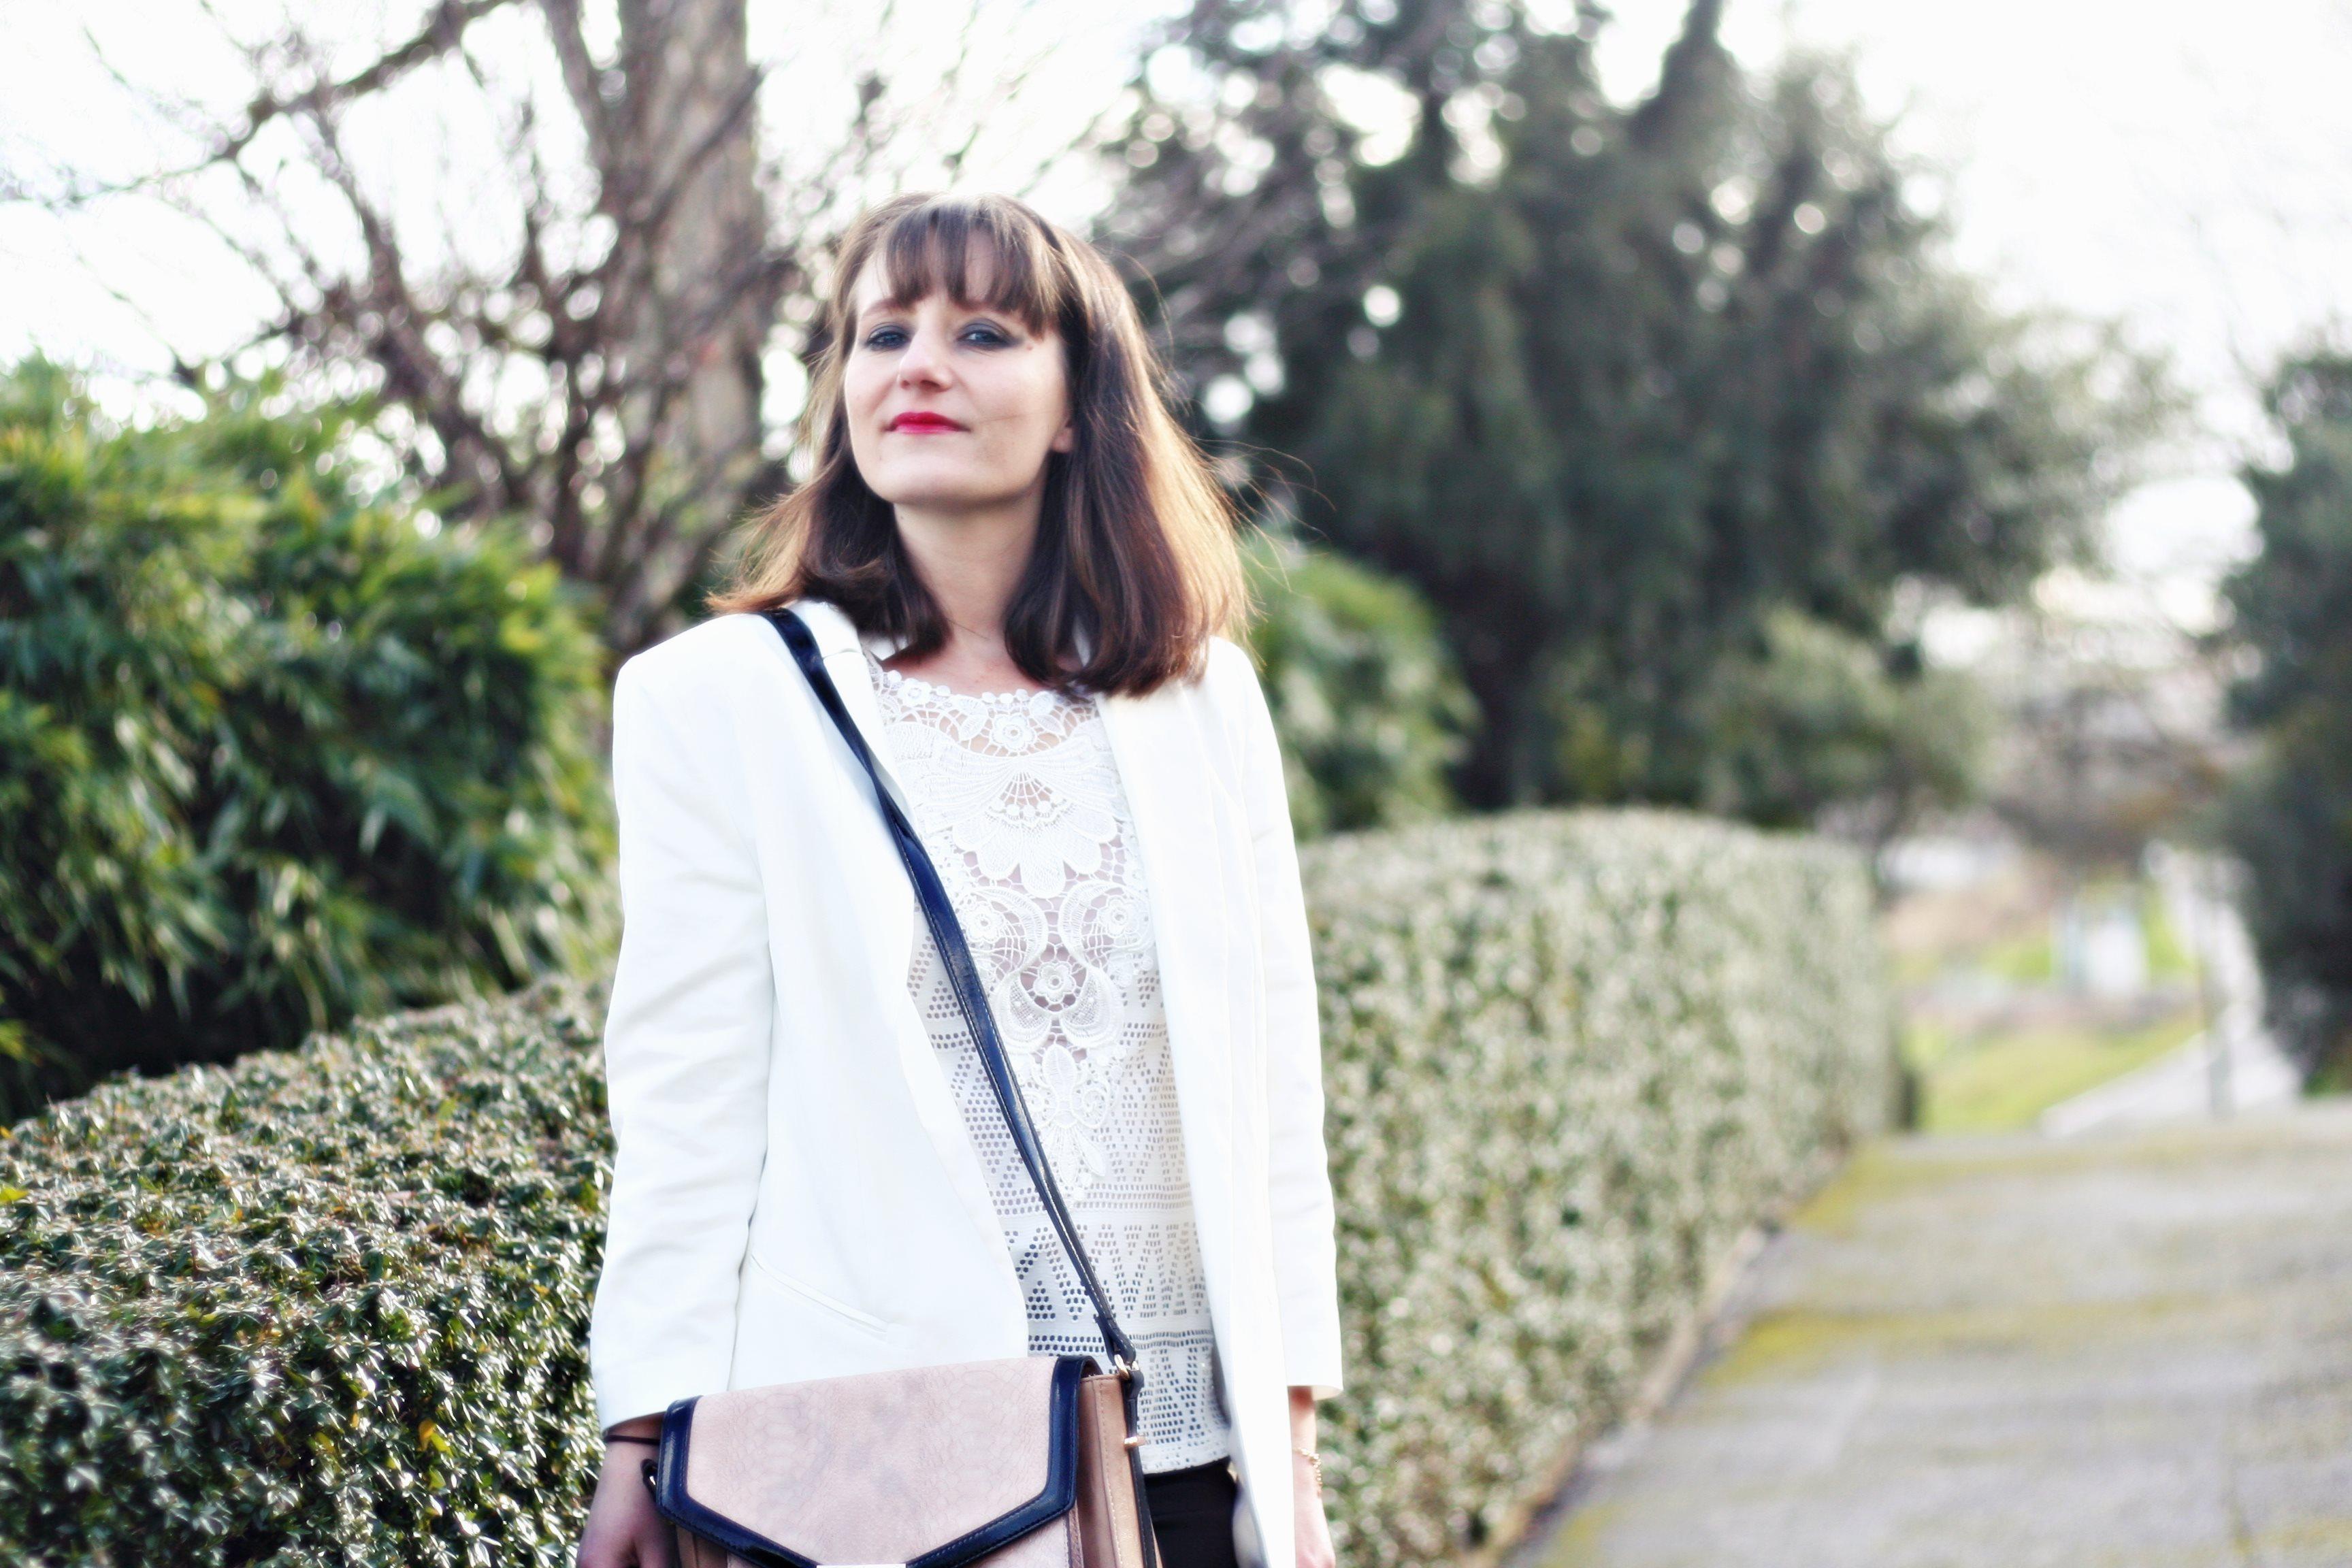 street-style-slim-cuir-chic-veromoda-vesteblanche-look-slim-cuir-veste-blanche-blog-mode-toulouse